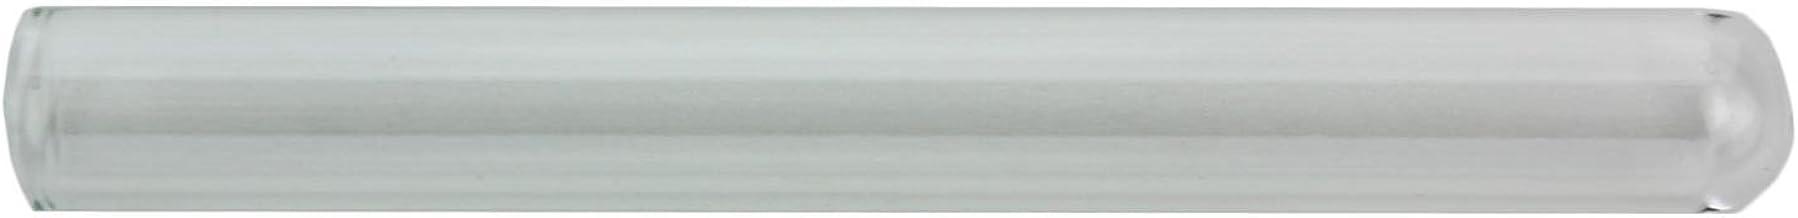 31.5 Length 17 Height 10 Width Pack of 450 Midland Scientific MBP 993 PK Slurry Pipet General Purpose Bulb